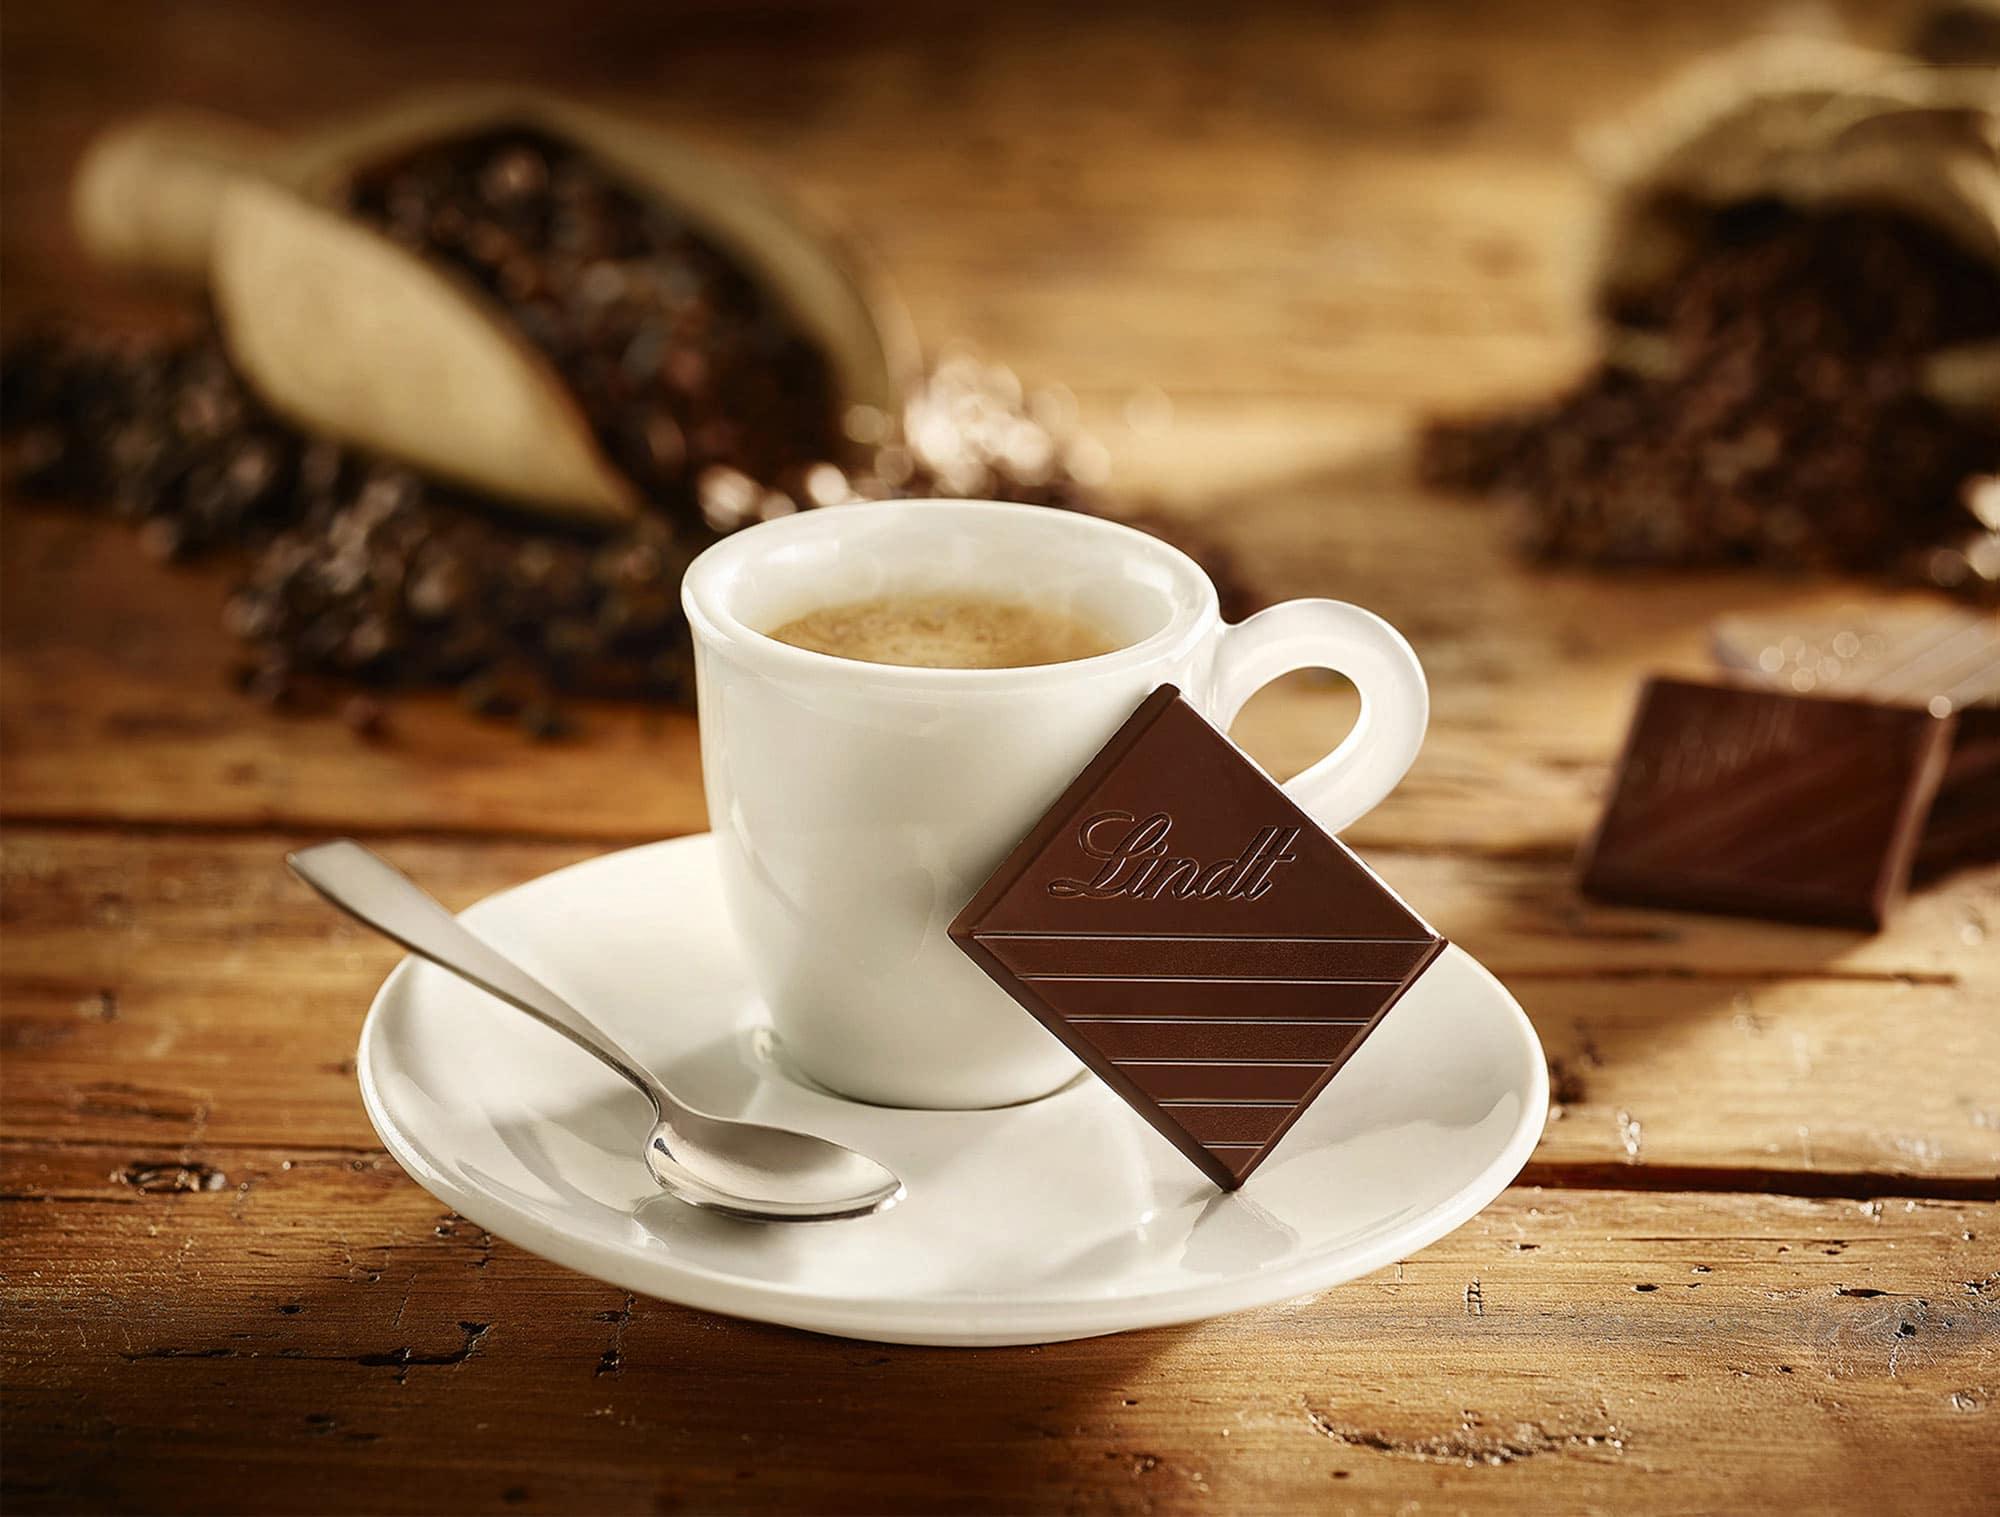 Lindt Tavoletta Cioccolato Tazza Caffè Food Shot by Fotografando